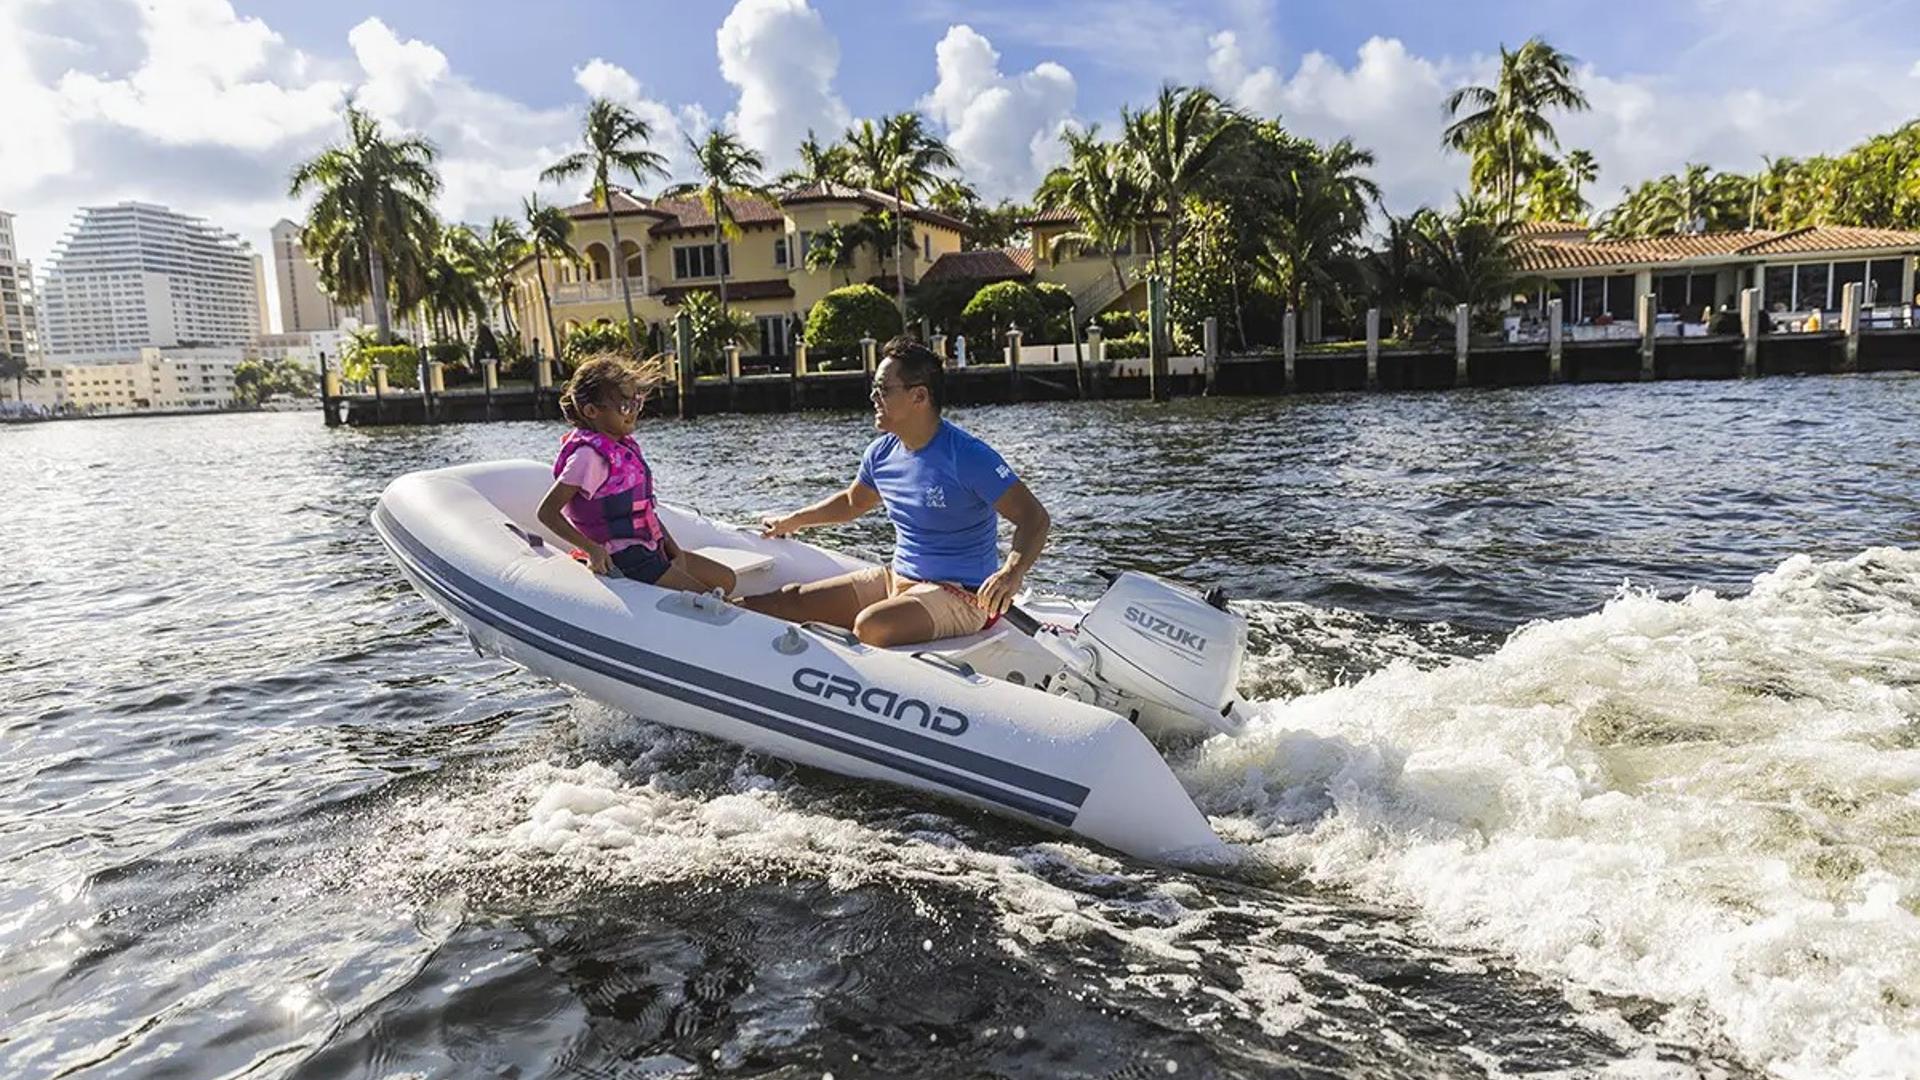 Надувная лодка с жестким дном GRAND Silver Line S330, Надувная лодка GRAND Silver Line S330, GRAND Silver Line S330, GRAND S330,GRAND Silver Line S330F, GRAND S330F,Надувная лодка GRAND, Надувная лодка ГРАНД, Надувная лодка с жестким дном, RIB, Rigid Inflatable Boats